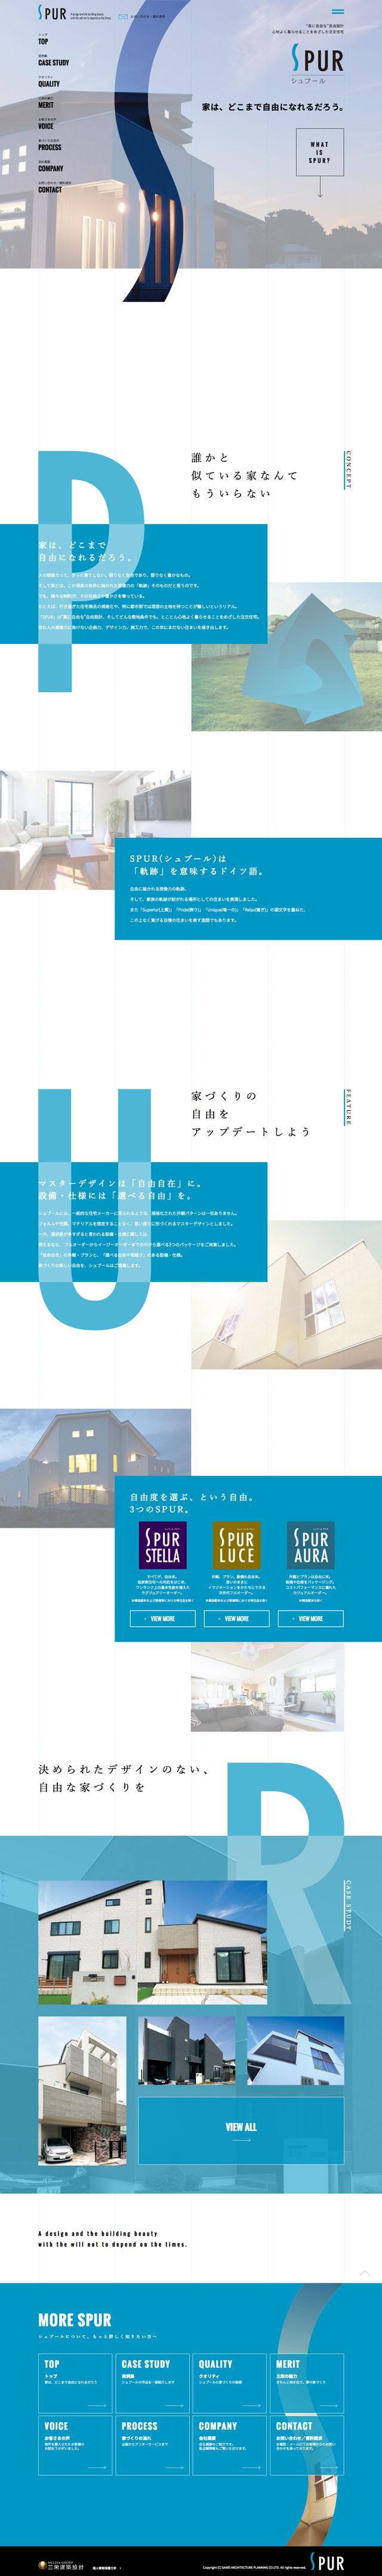 SPUR image